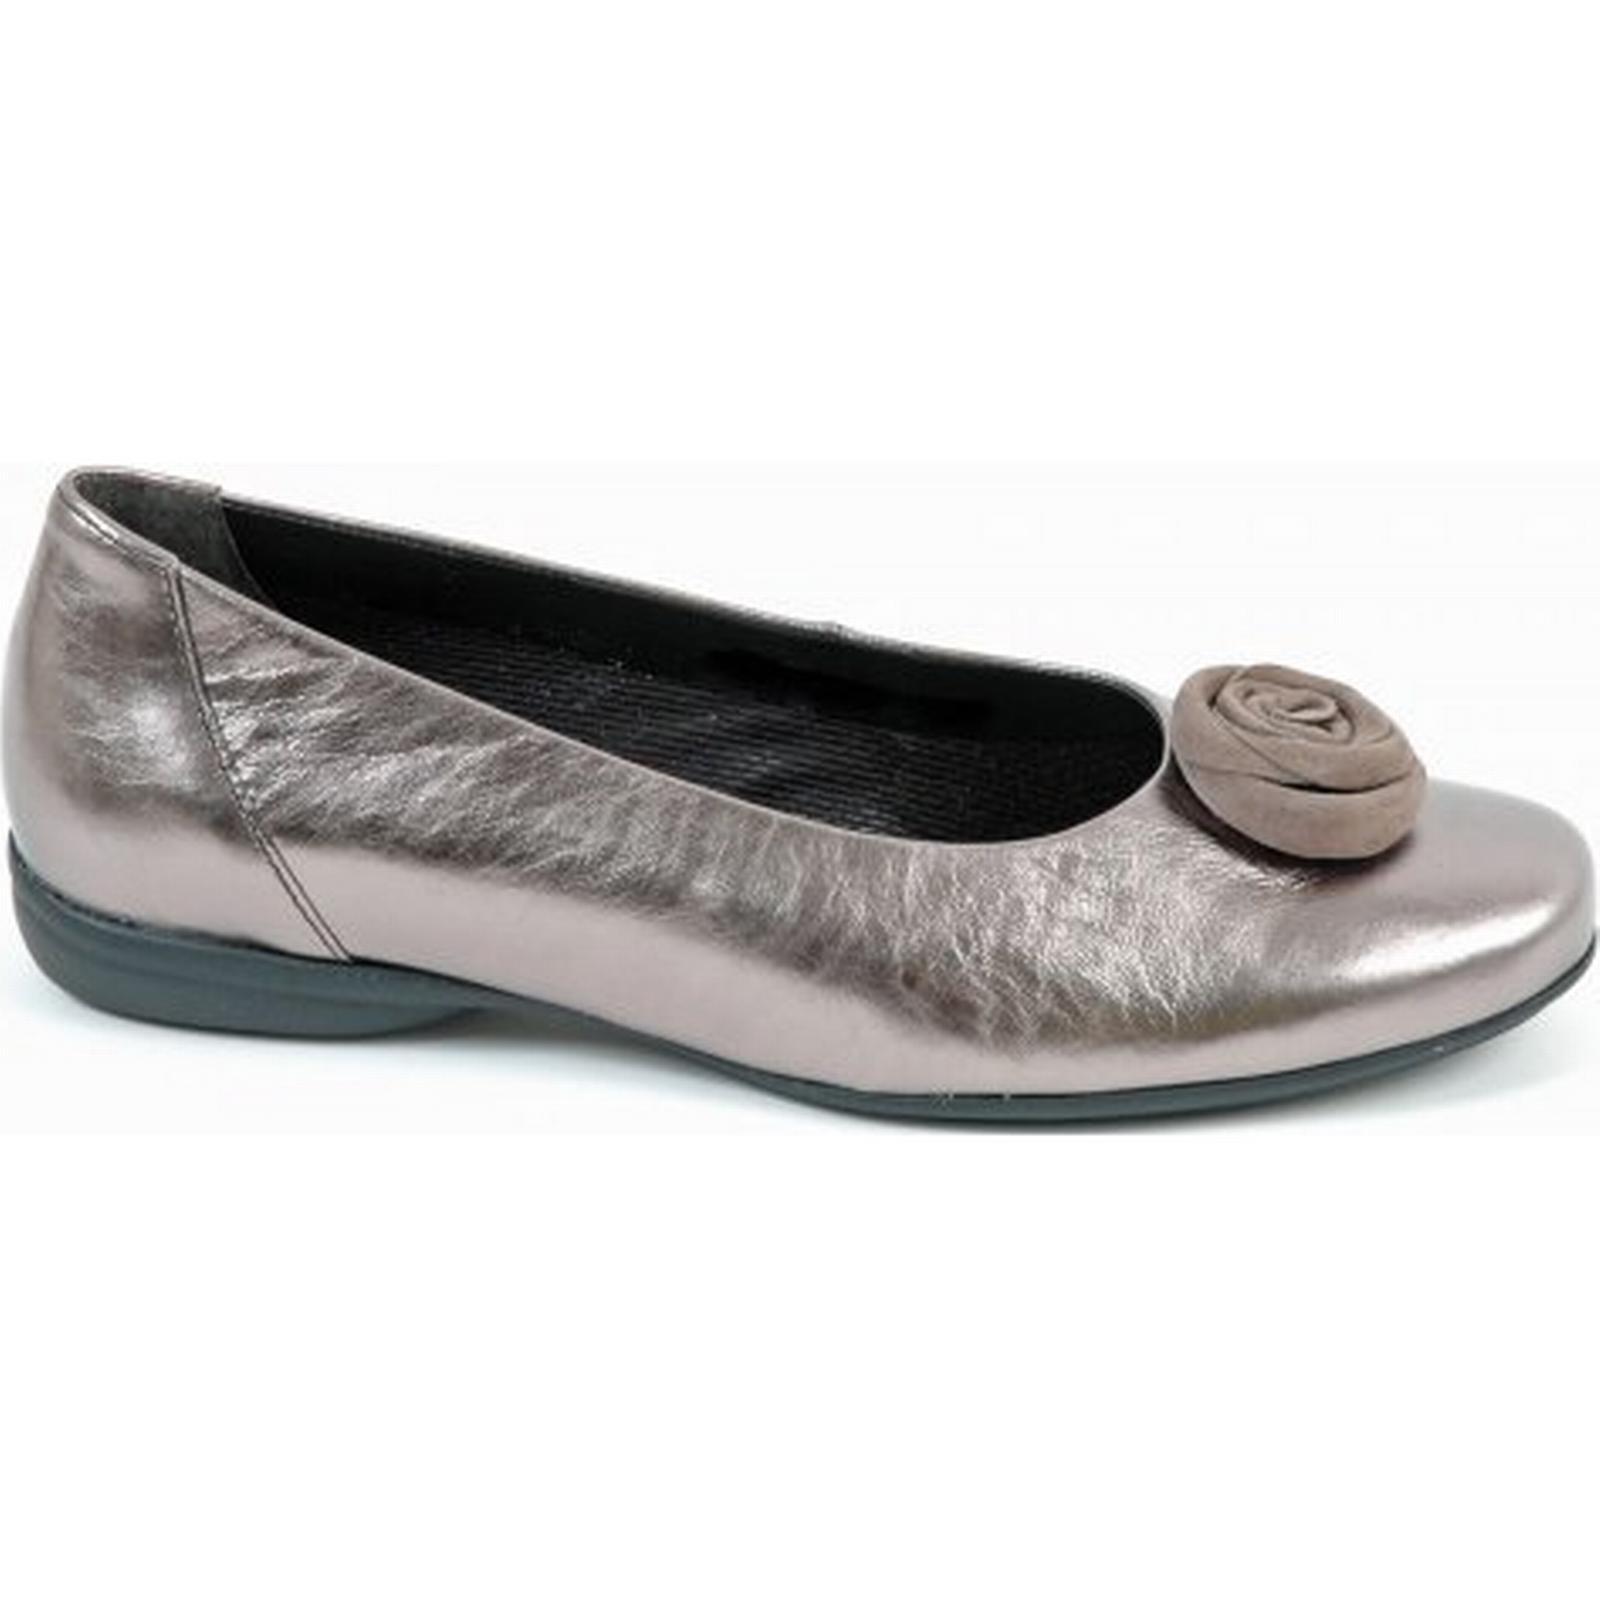 sports shoes bd3ea f831d Gabor OPERA GABOR SHOES OPERA 42 42 42 629 98 Size: 7 ...